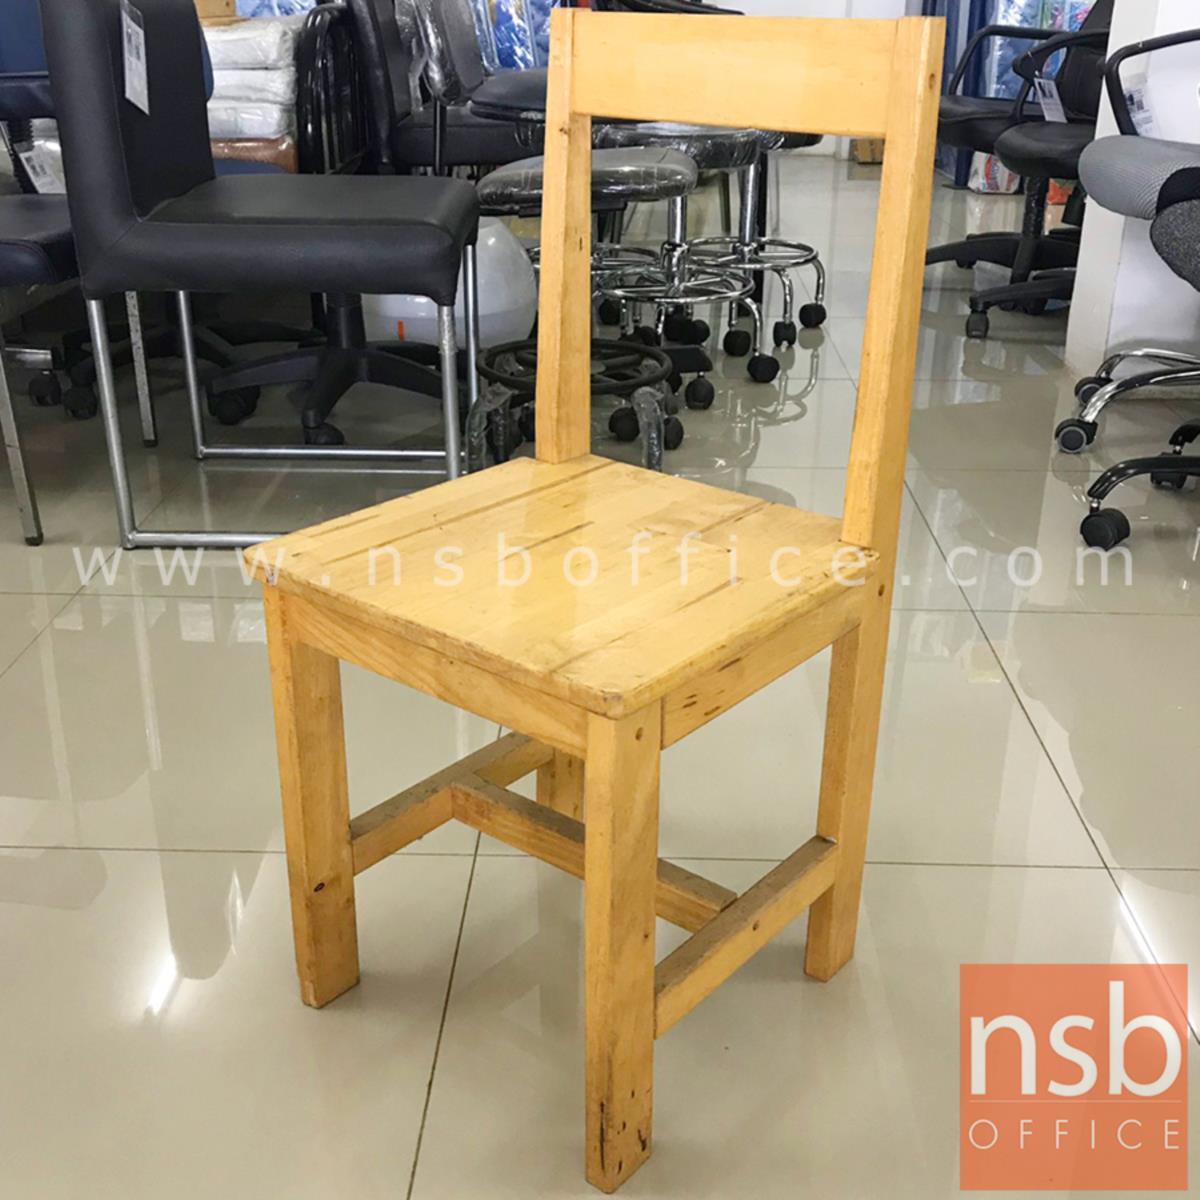 L02A287:เก้าอี้ไม้ล้วน รุ่น NSB-CHAIR2 ขนาด 35W*74H cm. (STOCK-1 ตัว)